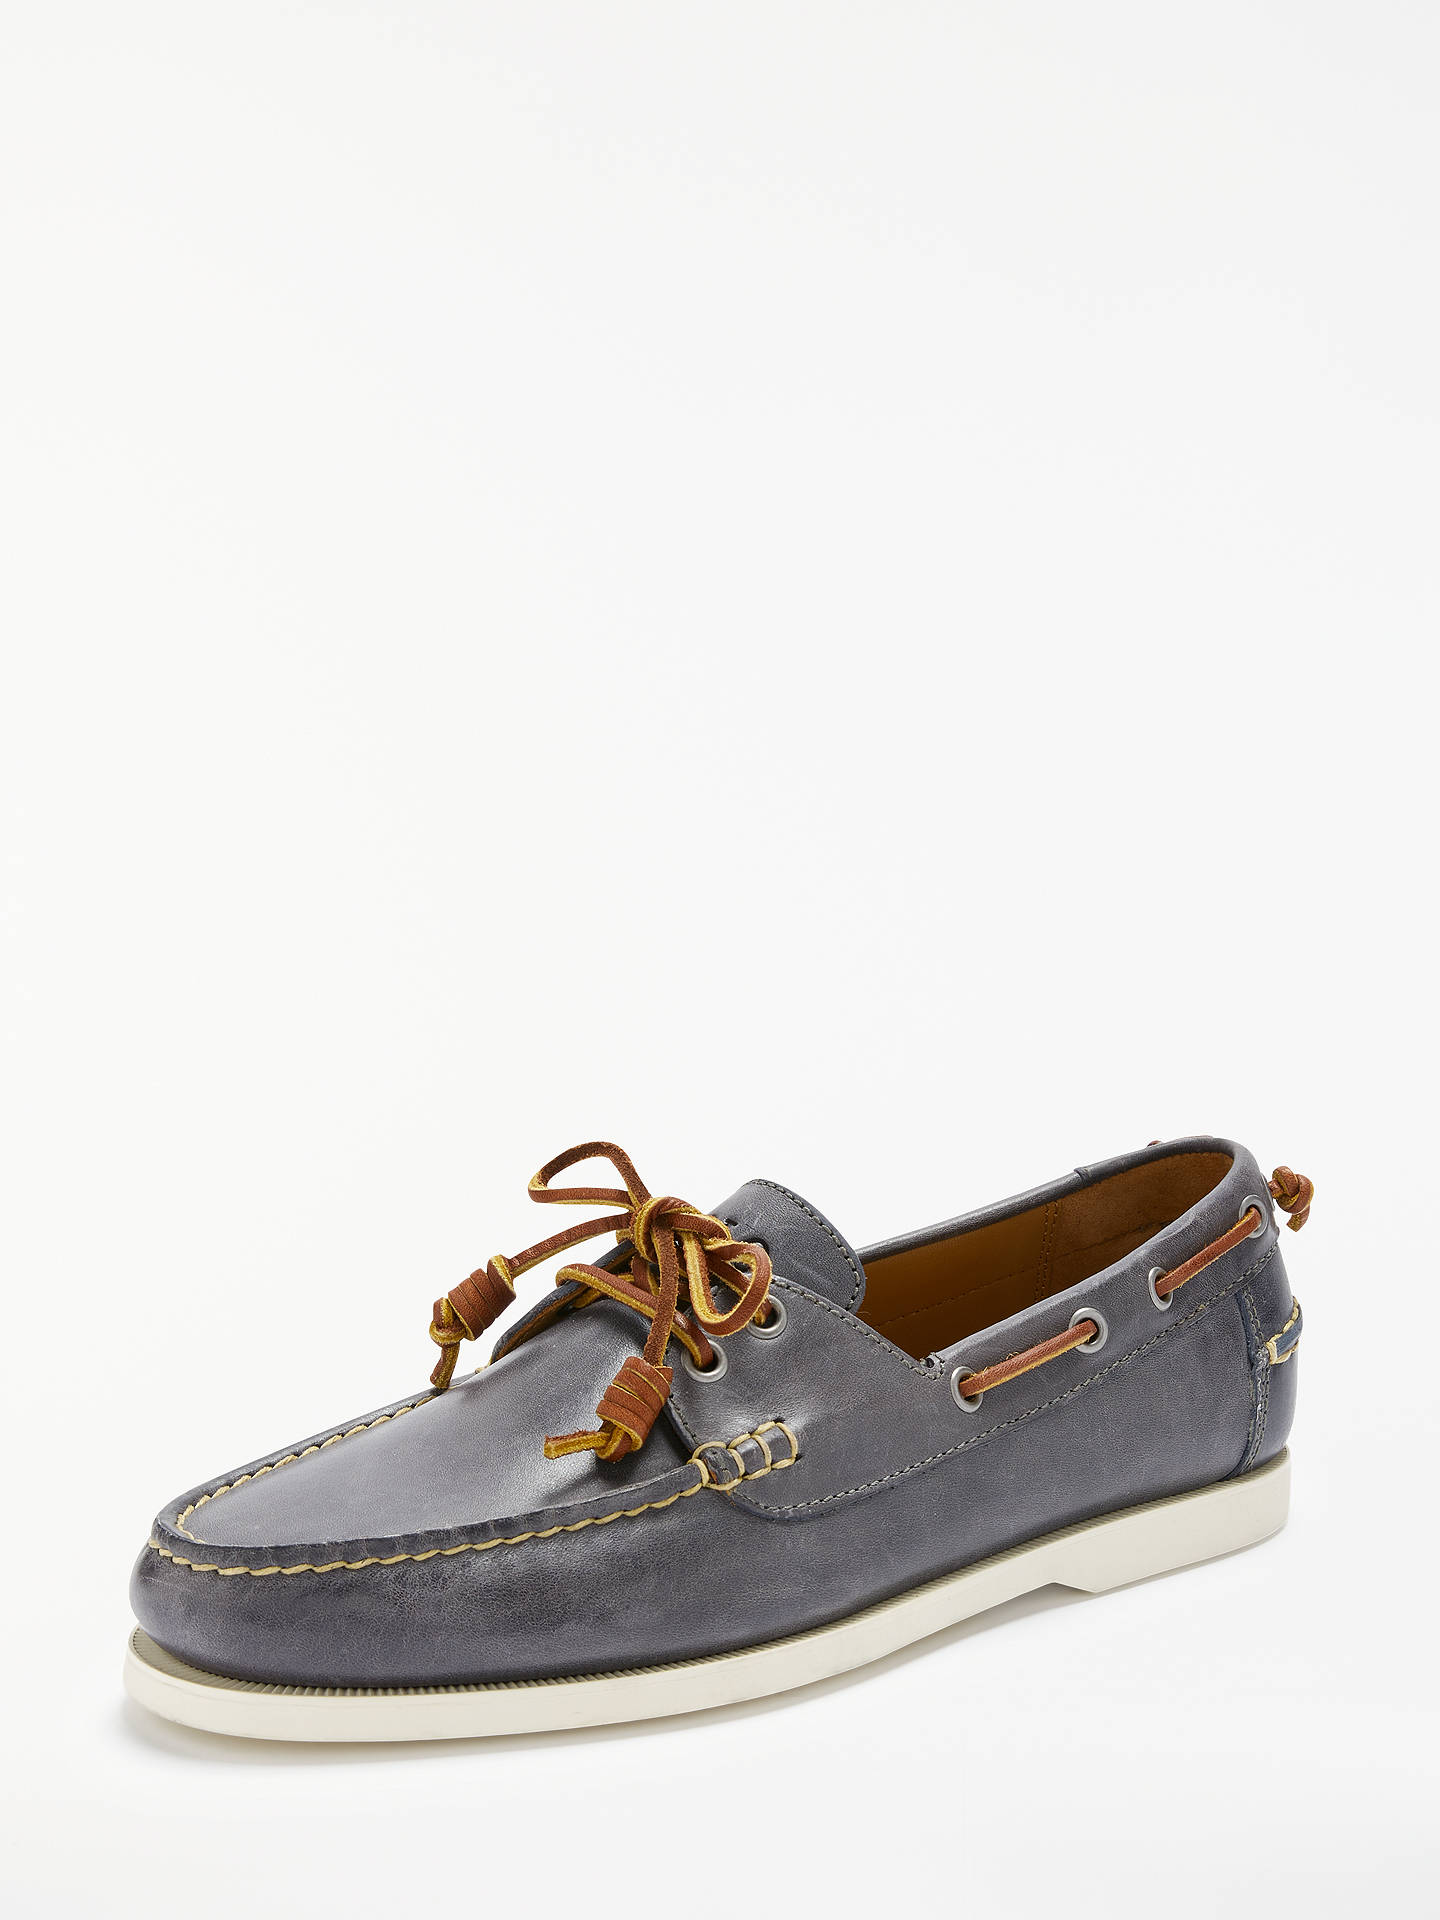 302d73ad86bb Buy Polo Ralph Lauren Merton Boat Shoes